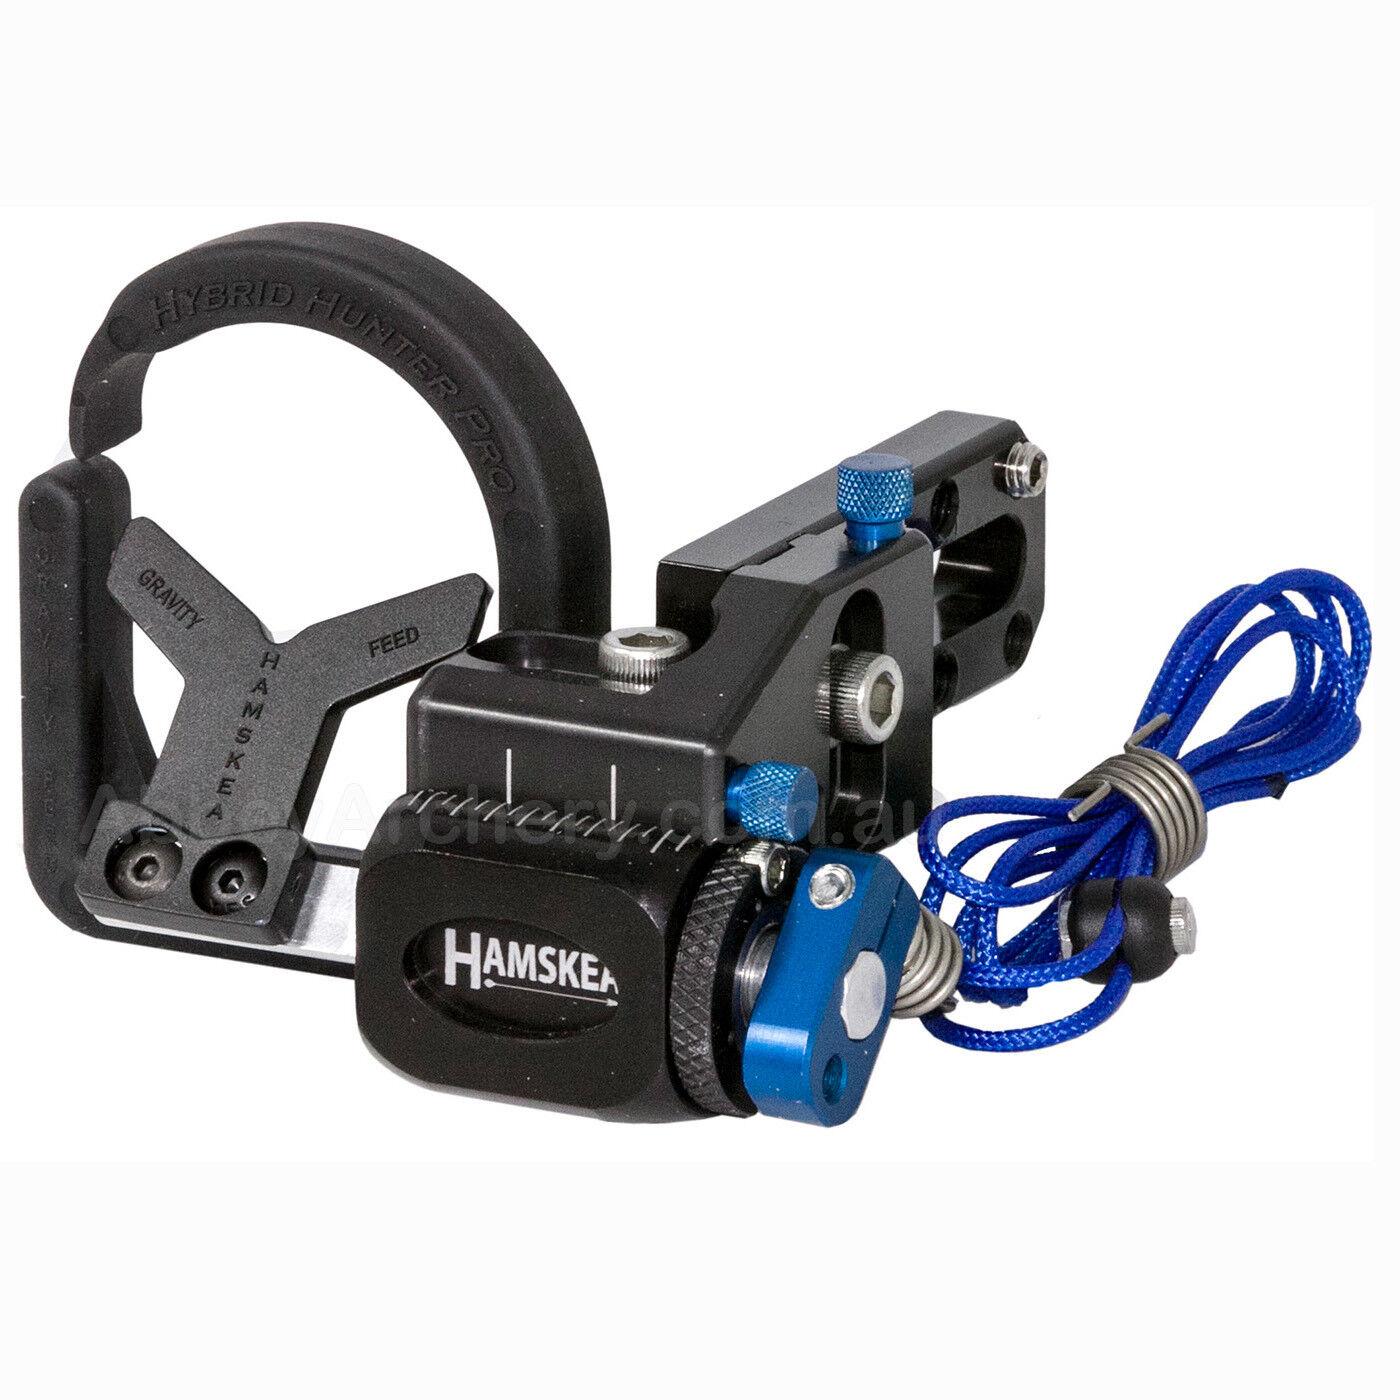 Hamskea Archery híbrido Hunter Pro Micro-Tune resto versarest encendedor de plataforma